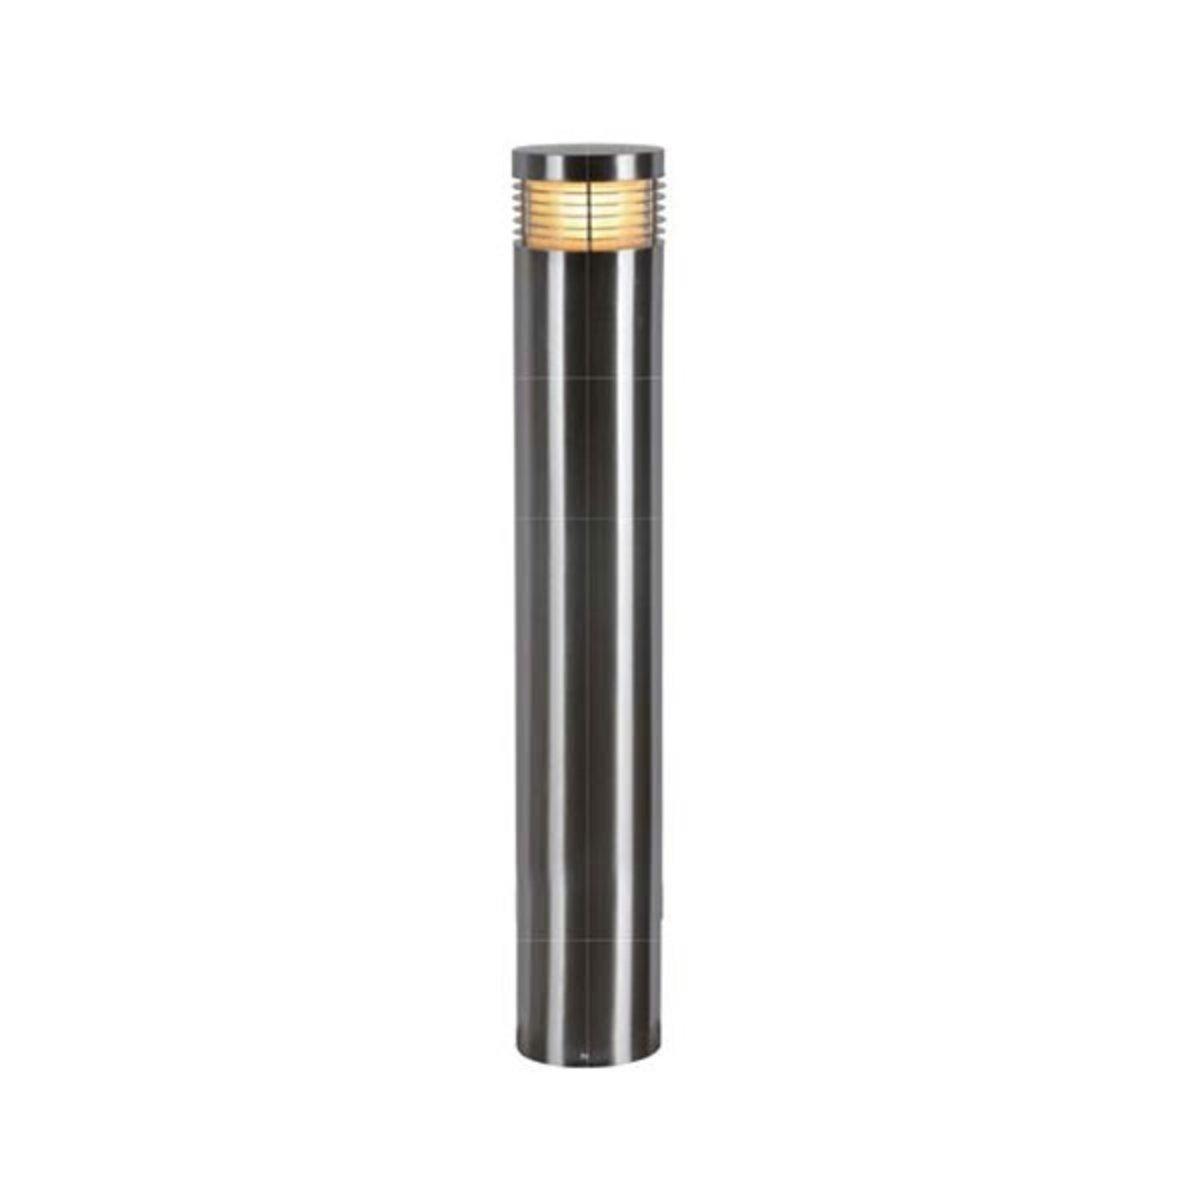 Stainless Steel Bollard - Bullard Bollards Lighting (4)